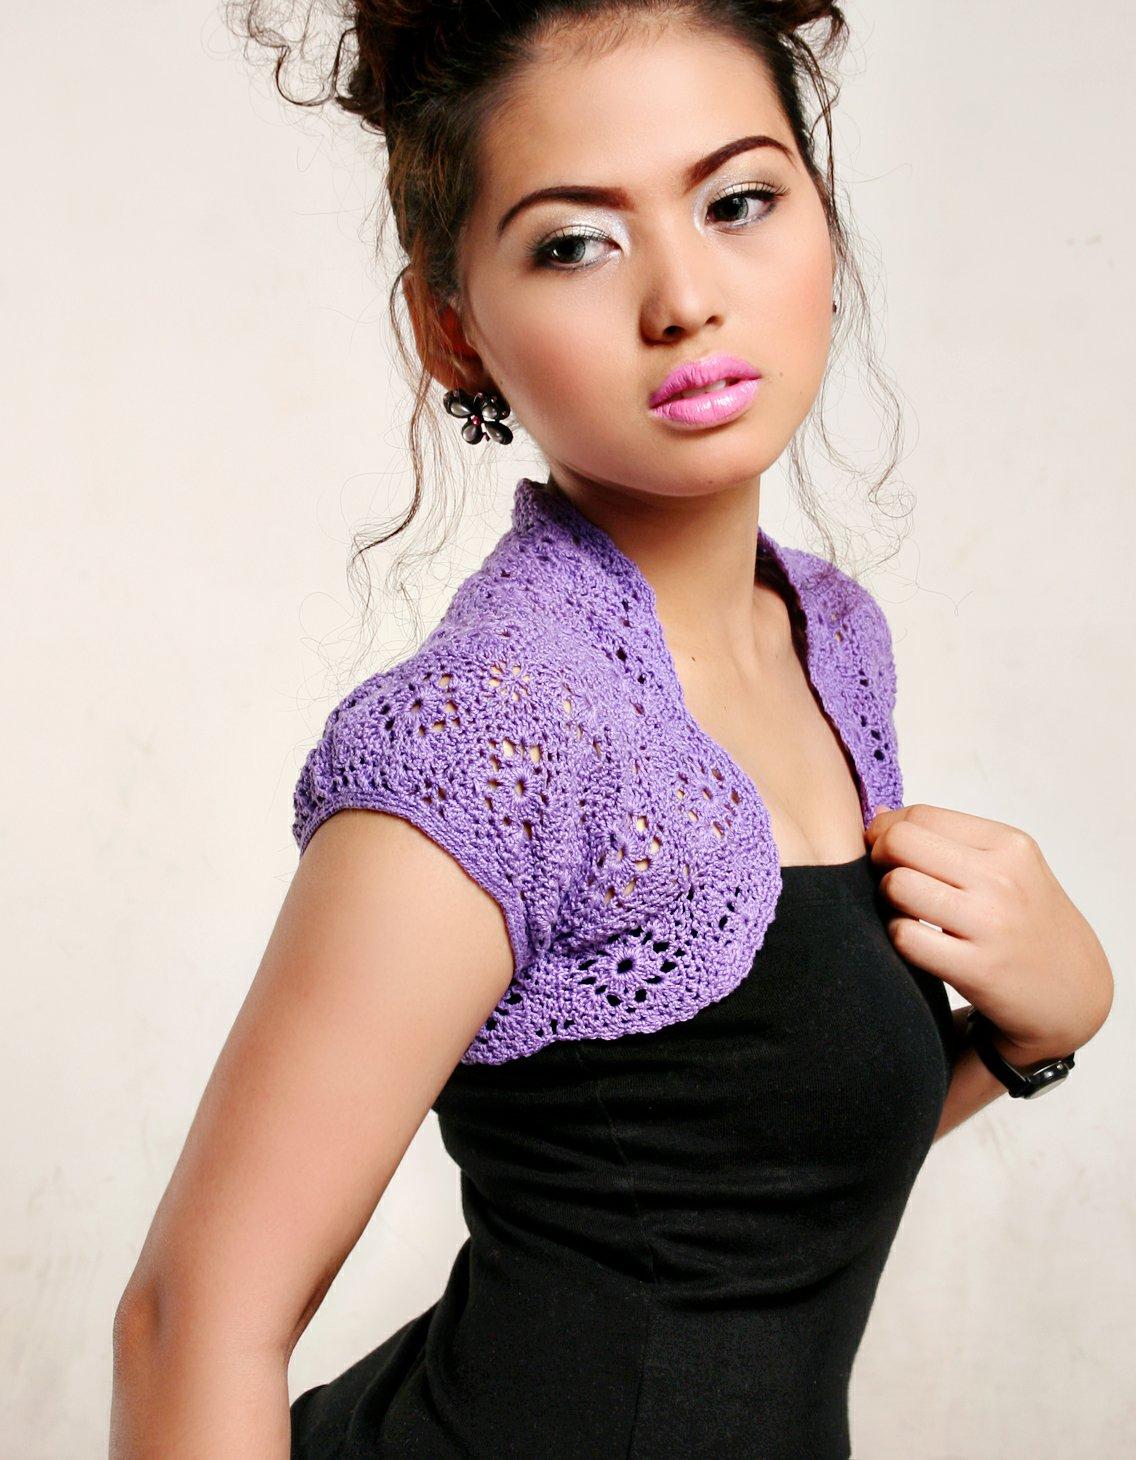 Crochet Flower Shrug Pattern : Crochet and Other Stuff: Crochet a motif shrug